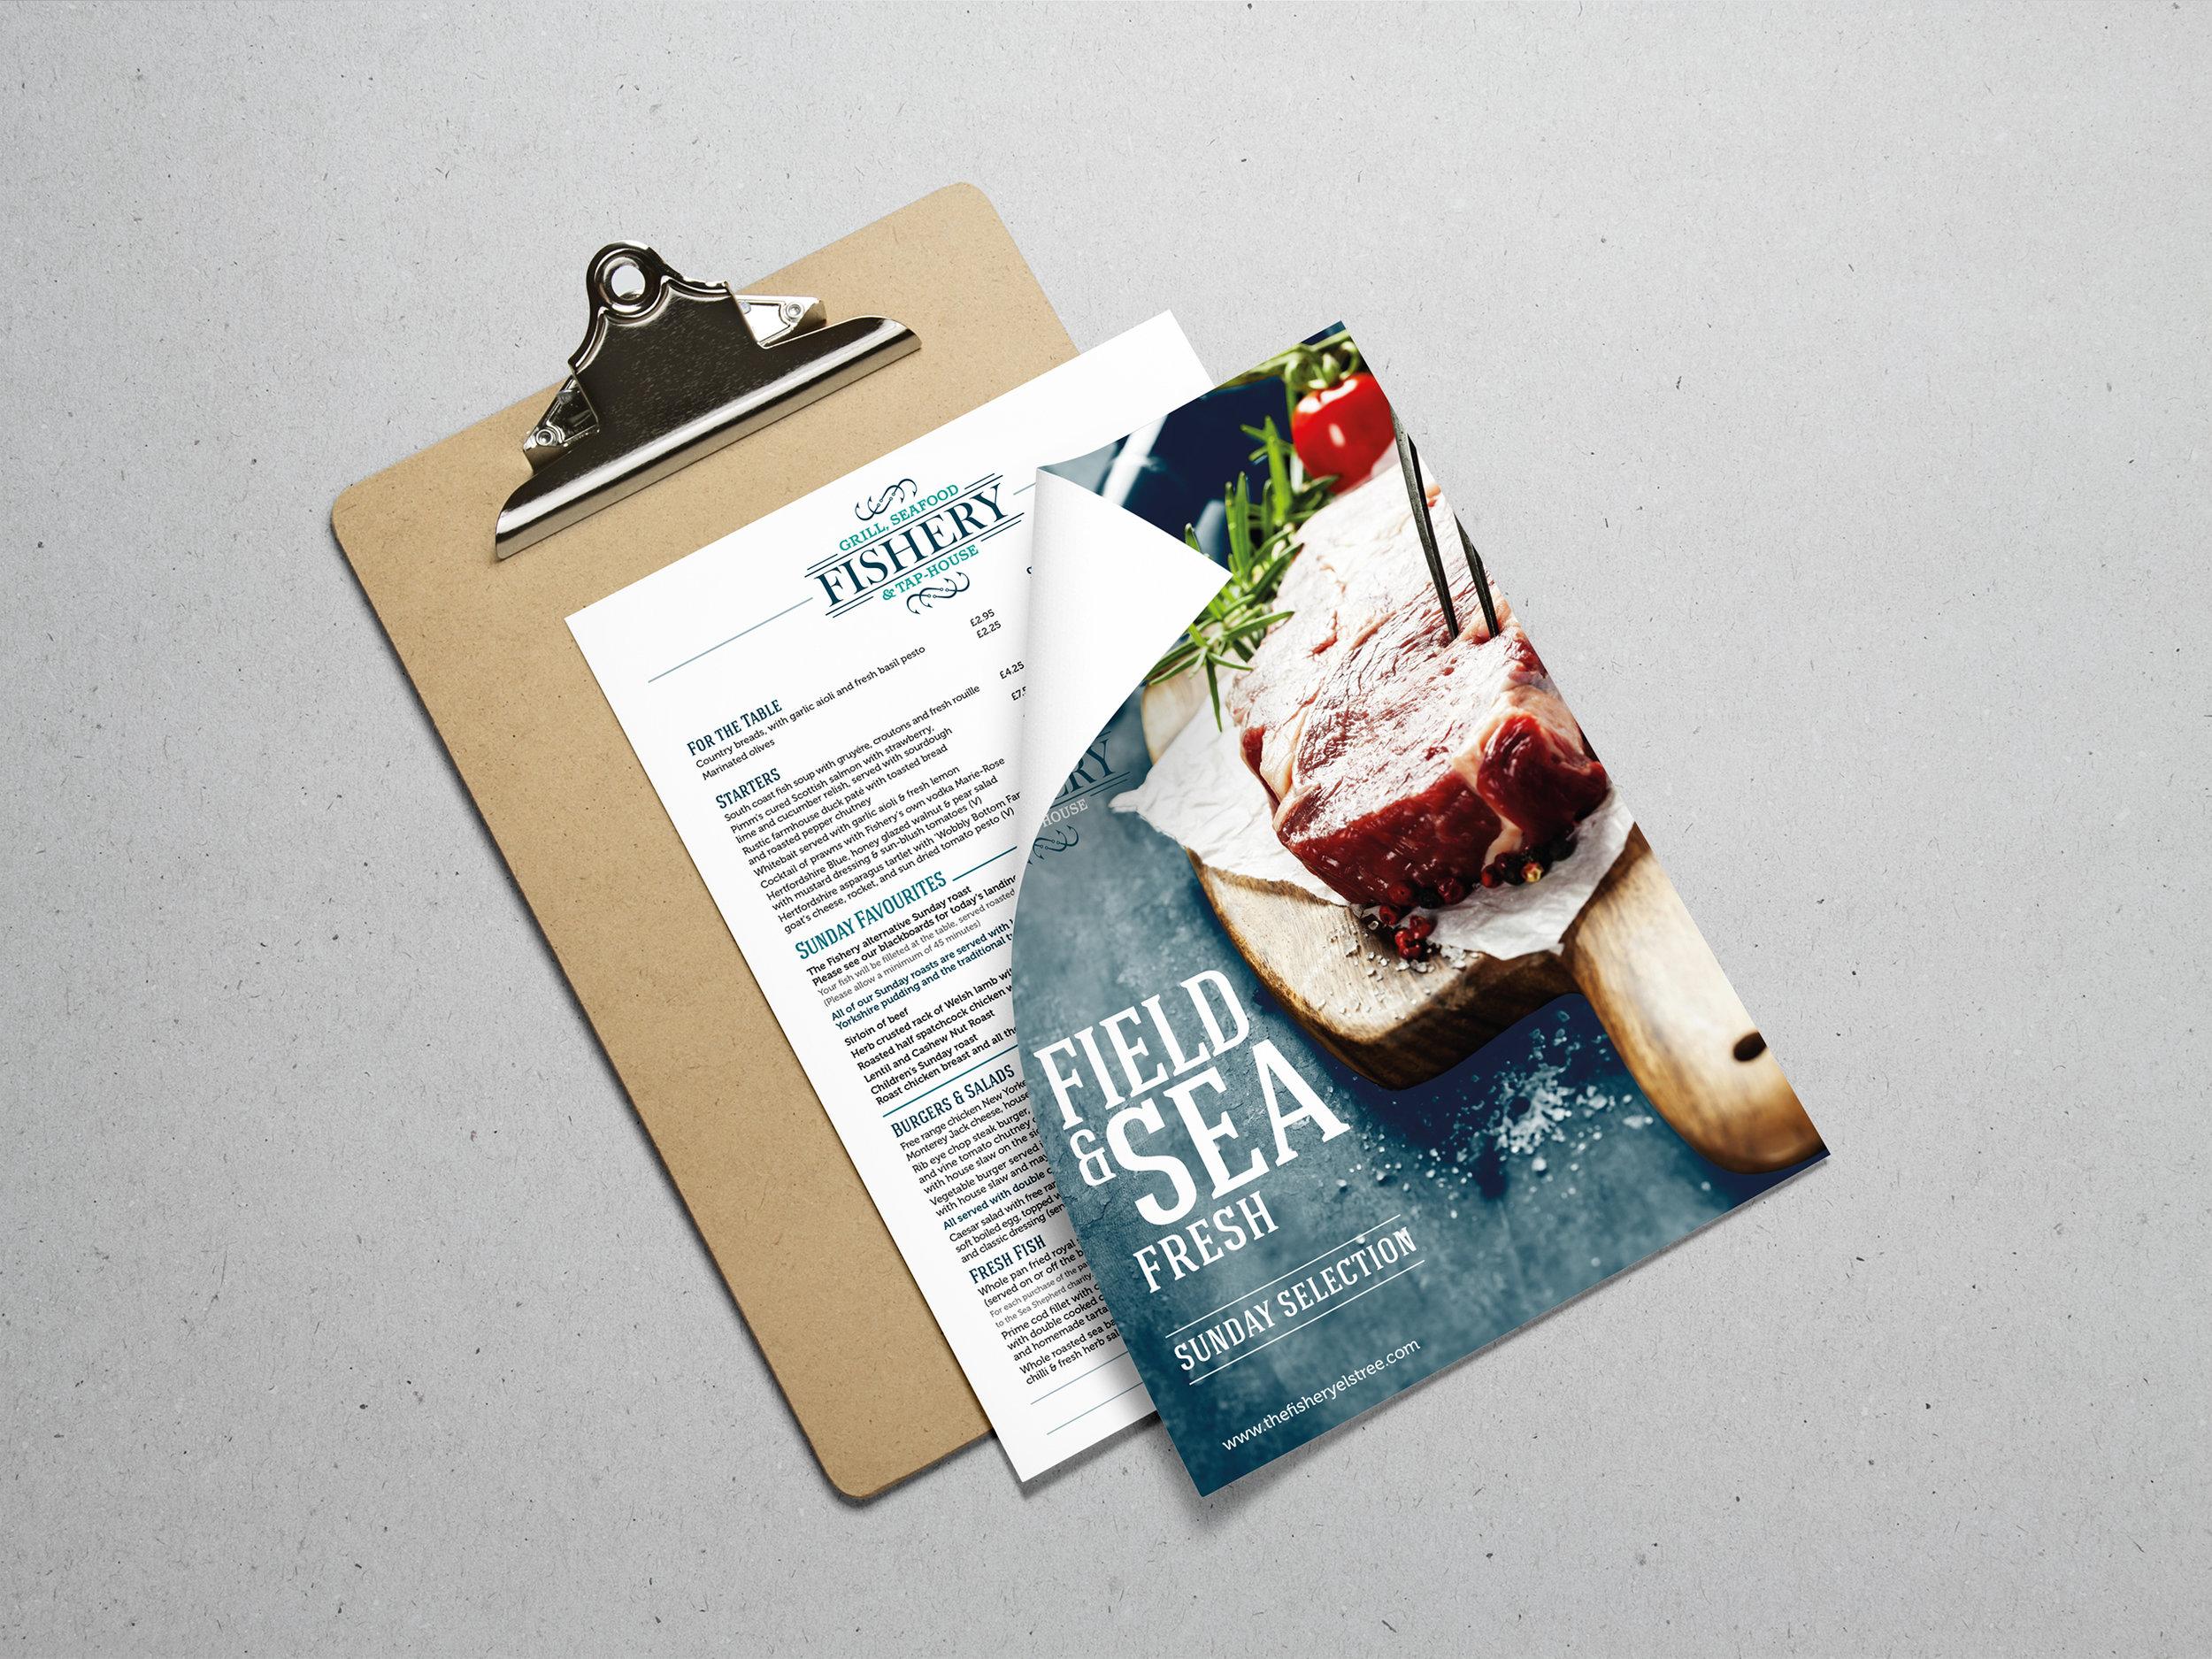 Fishery Menu A4_smaller.jpg